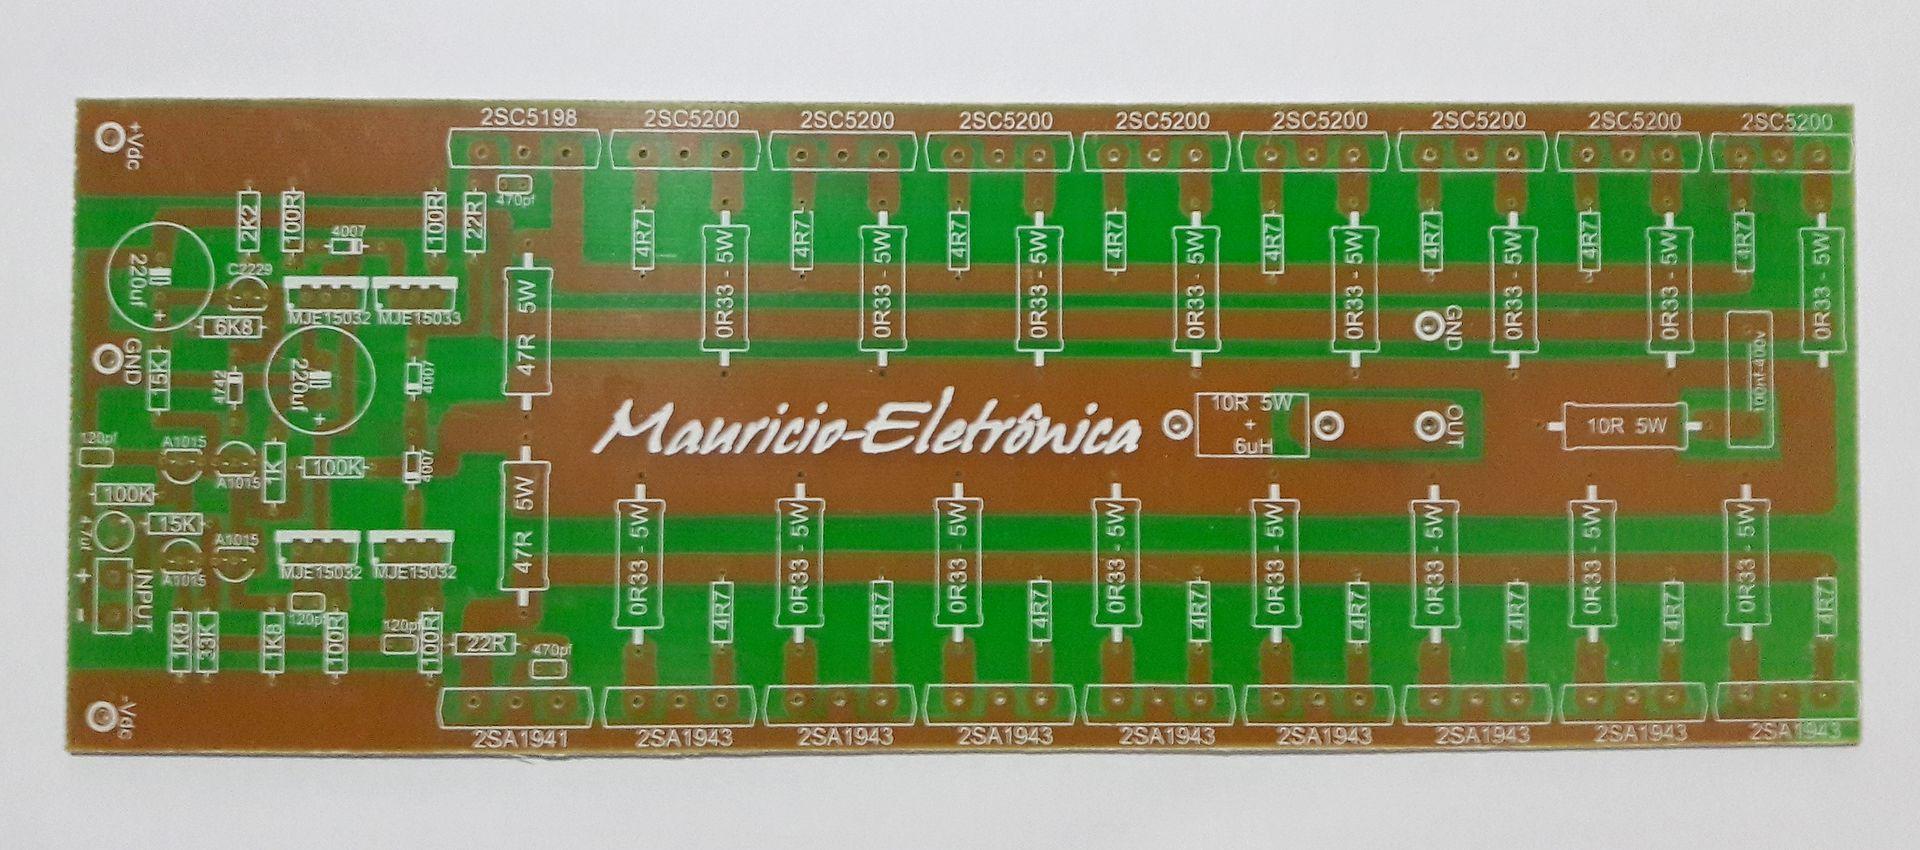 Placa Lisa Para Montar Amplificador Profissional 1600w 2 Ohms Current Limiting Audio Amplifier Circuit Amplifiercircuitsaudio Mauricio Eletronica Amplificadores De Audio200w300w400w500w700w1000w